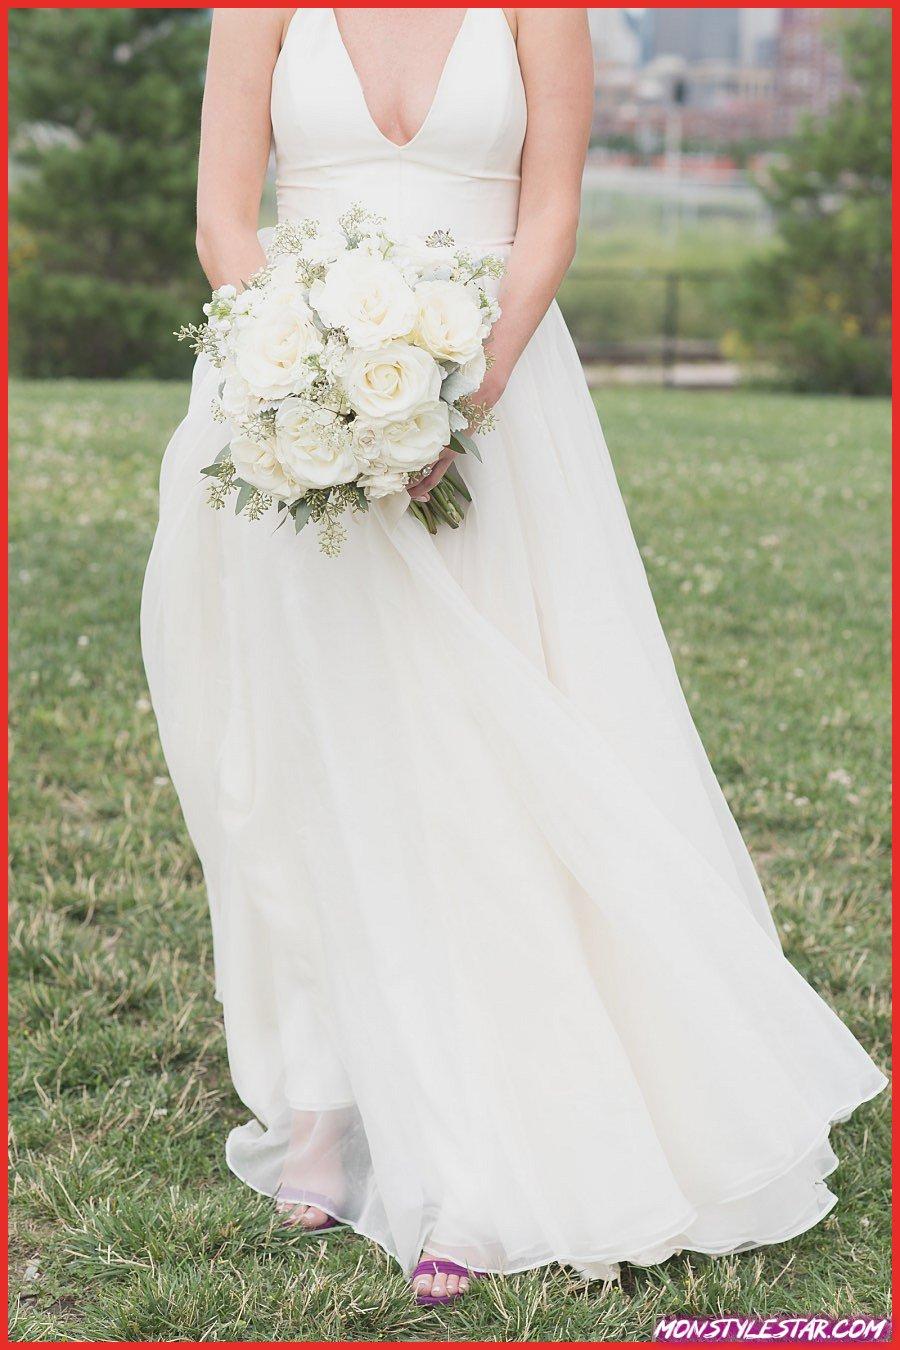 Mariage chic et moderne à Chicago au Geraghty